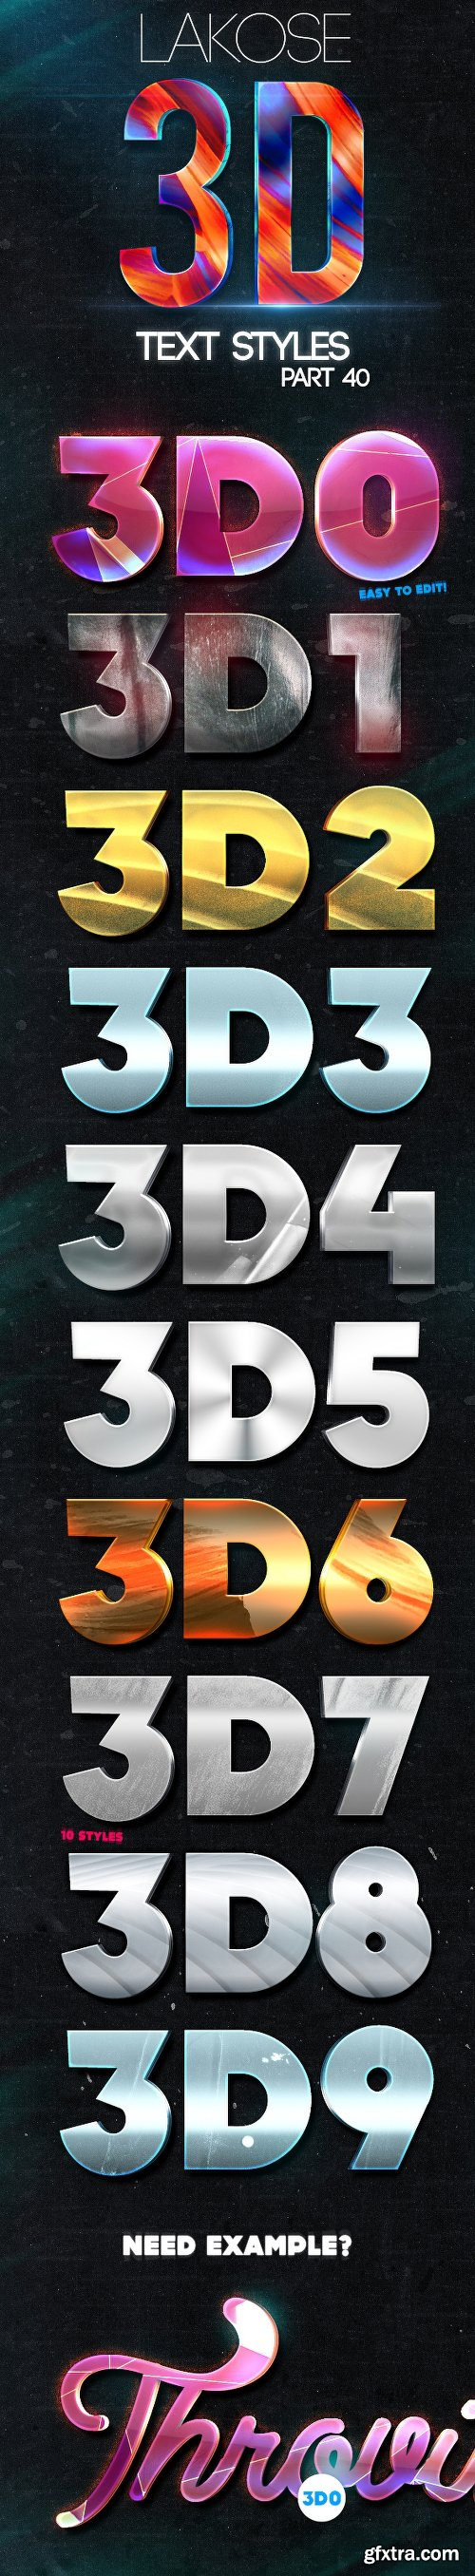 Graphicriver Lakose 3D Text Styles Part 40 22773273